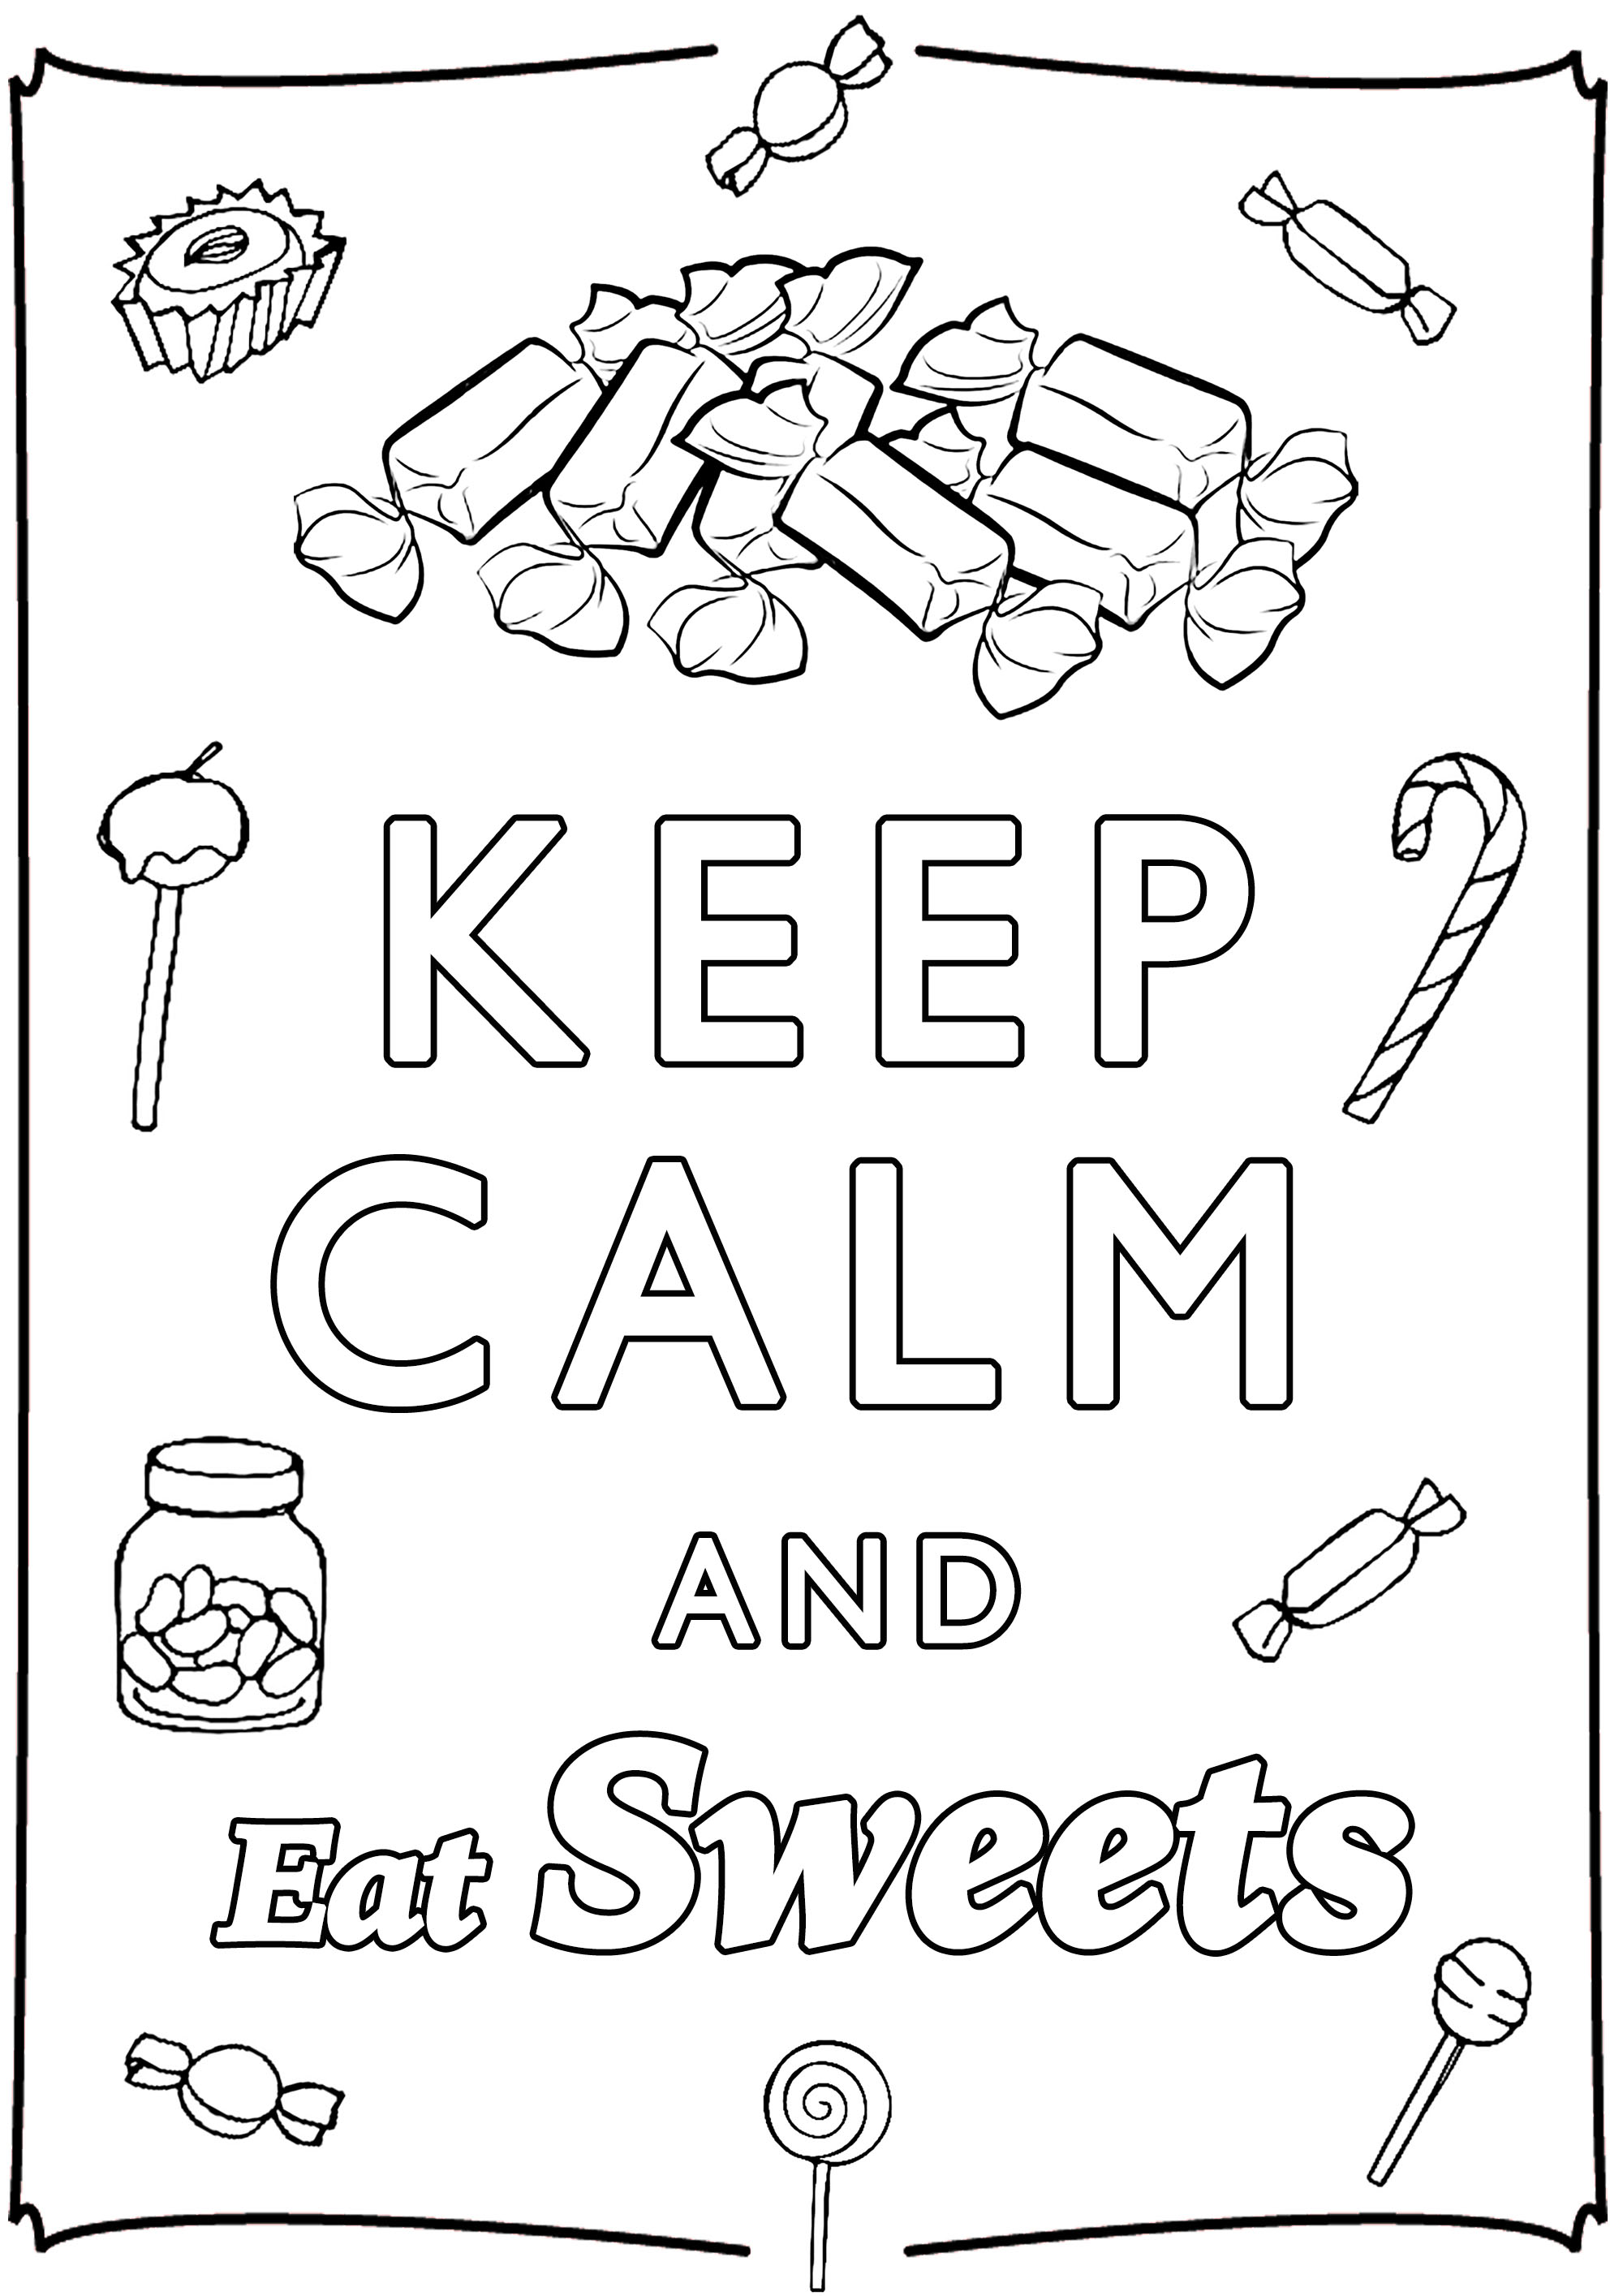 Disegni da Colorare per Adulti : Keep Calm - 12